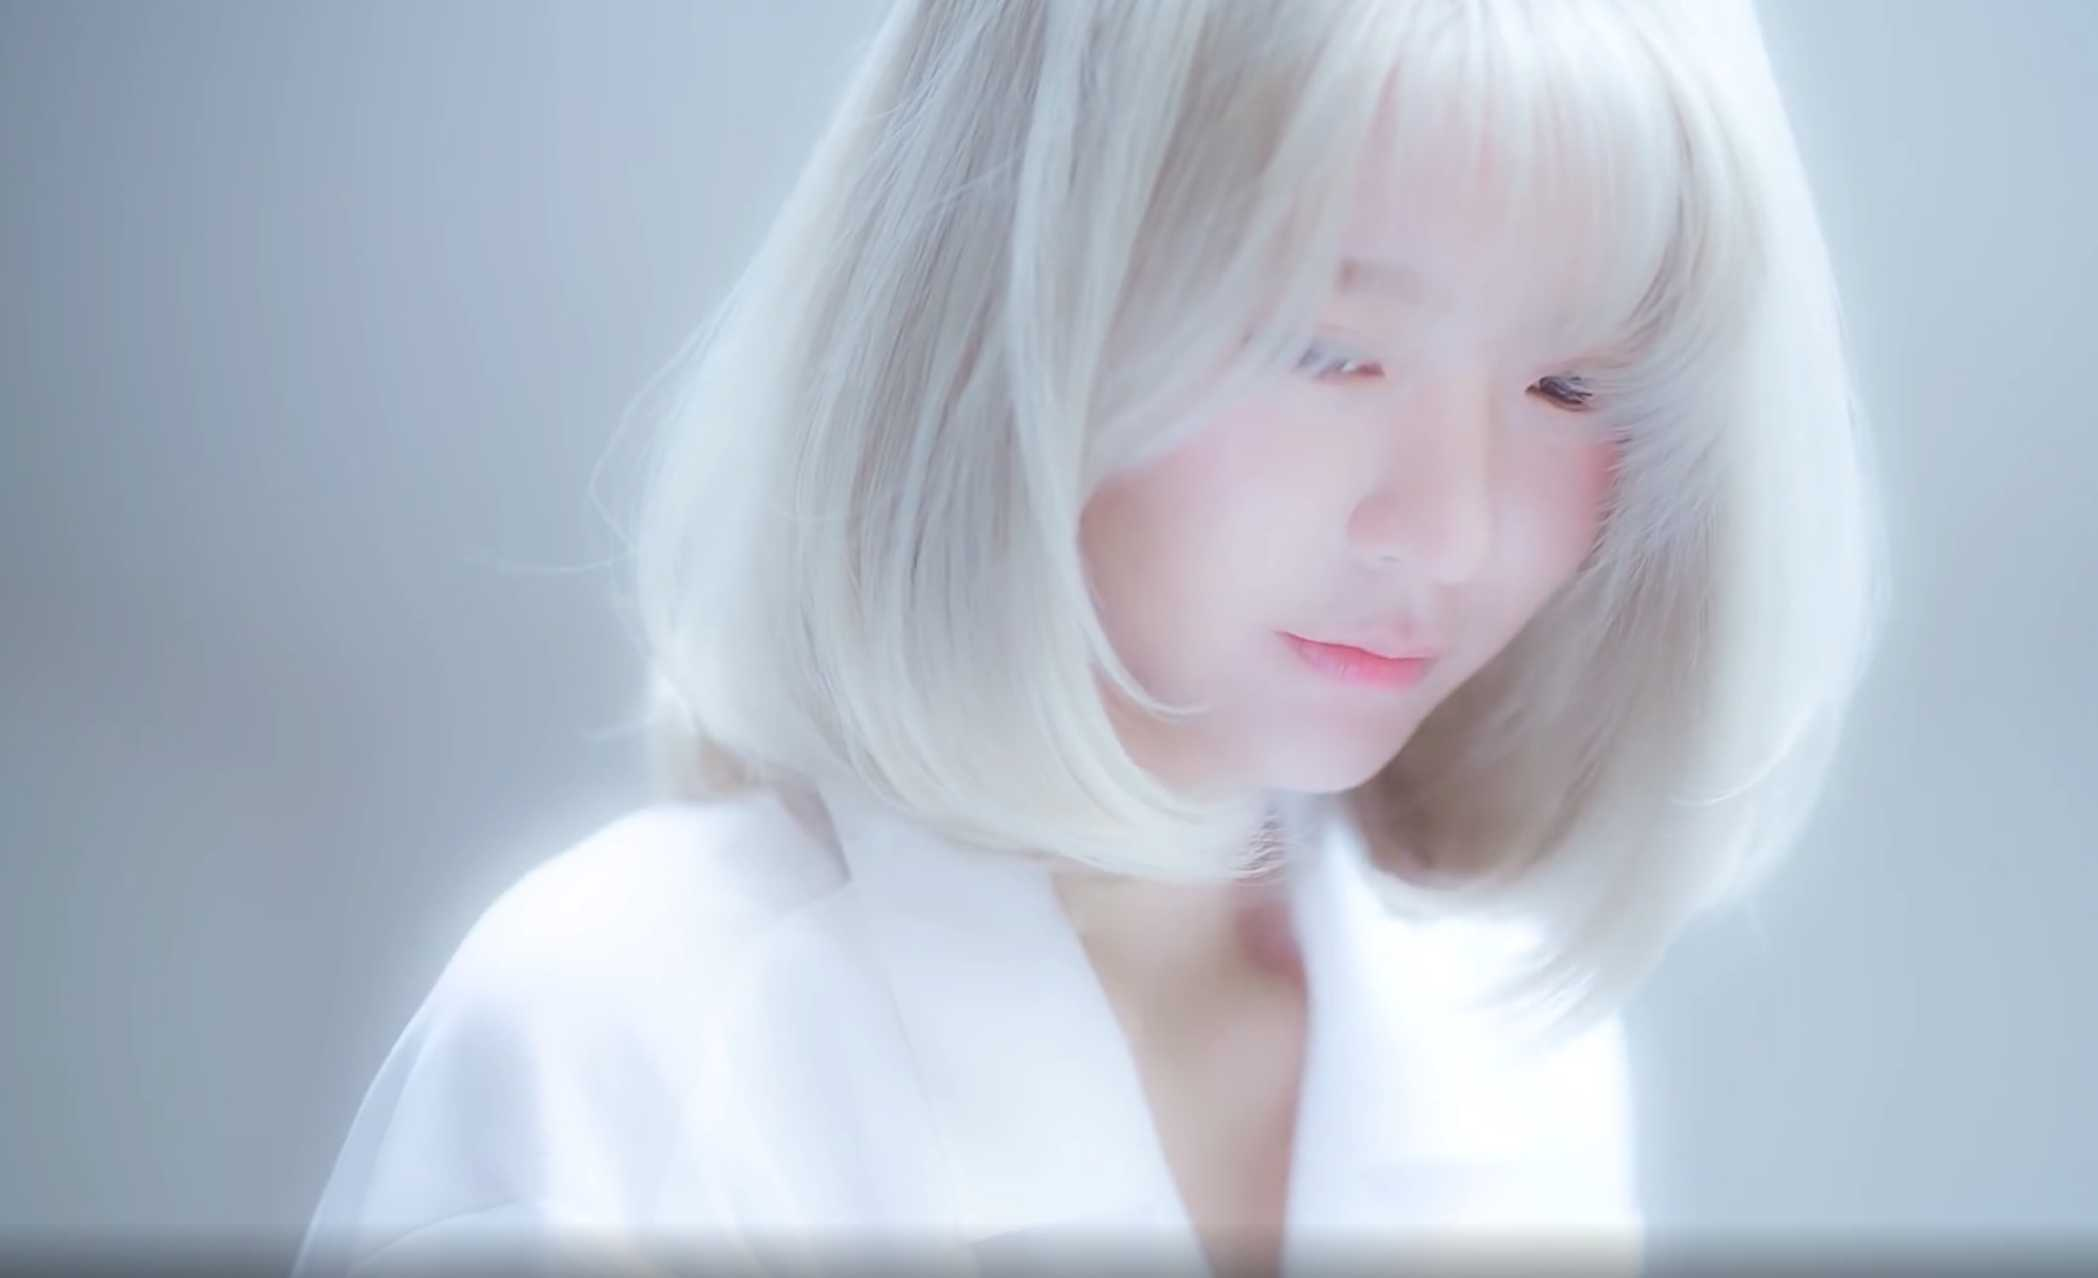 [MV]オレンジ (orange) Cover - 7!! Cover by yurisa